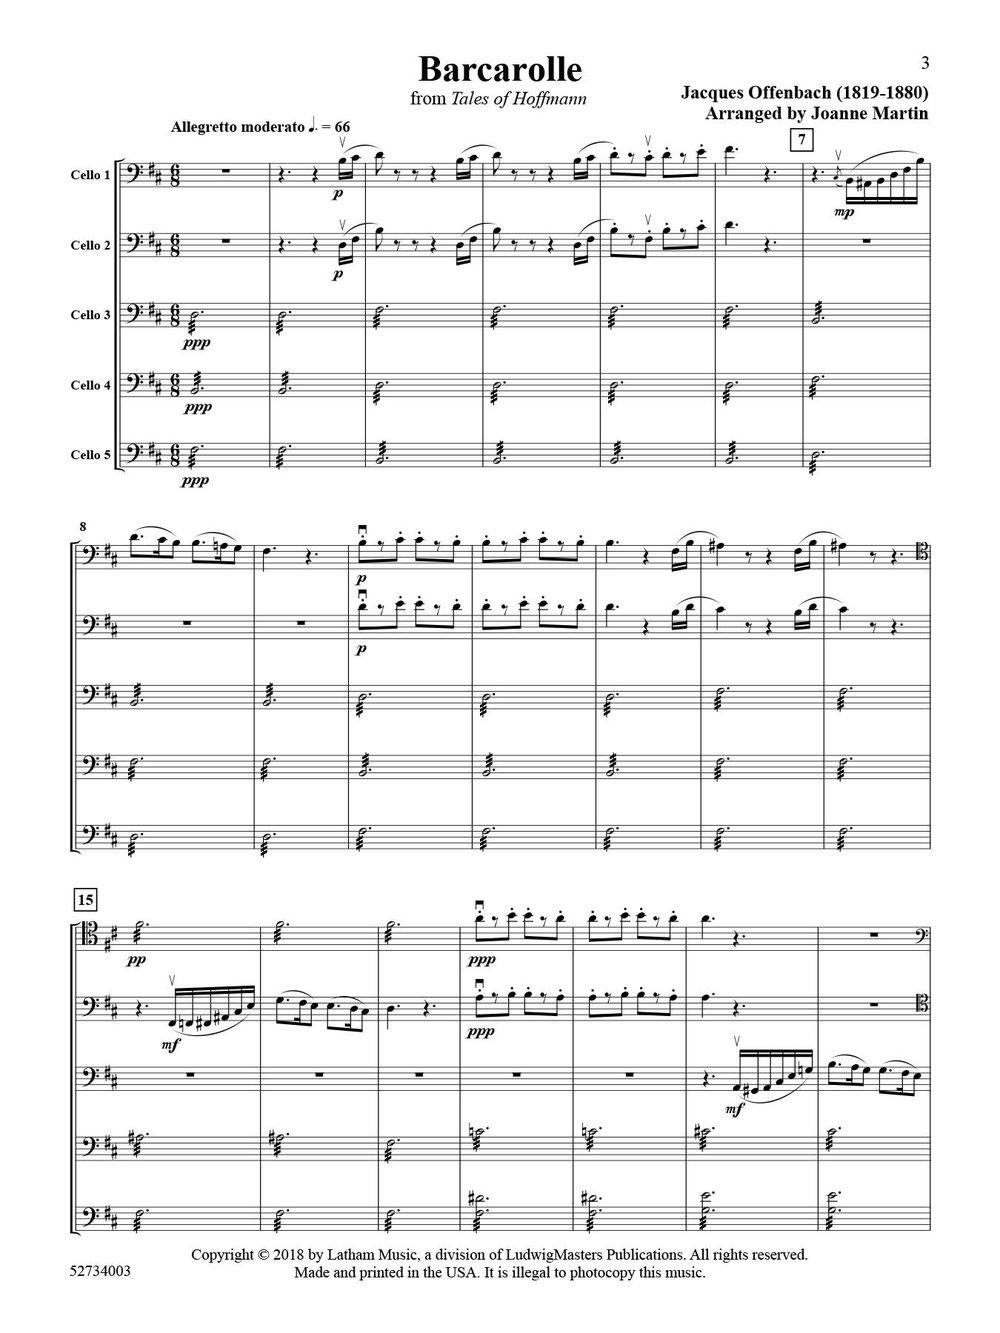 barcarolle-cello-quintet-score.jpg